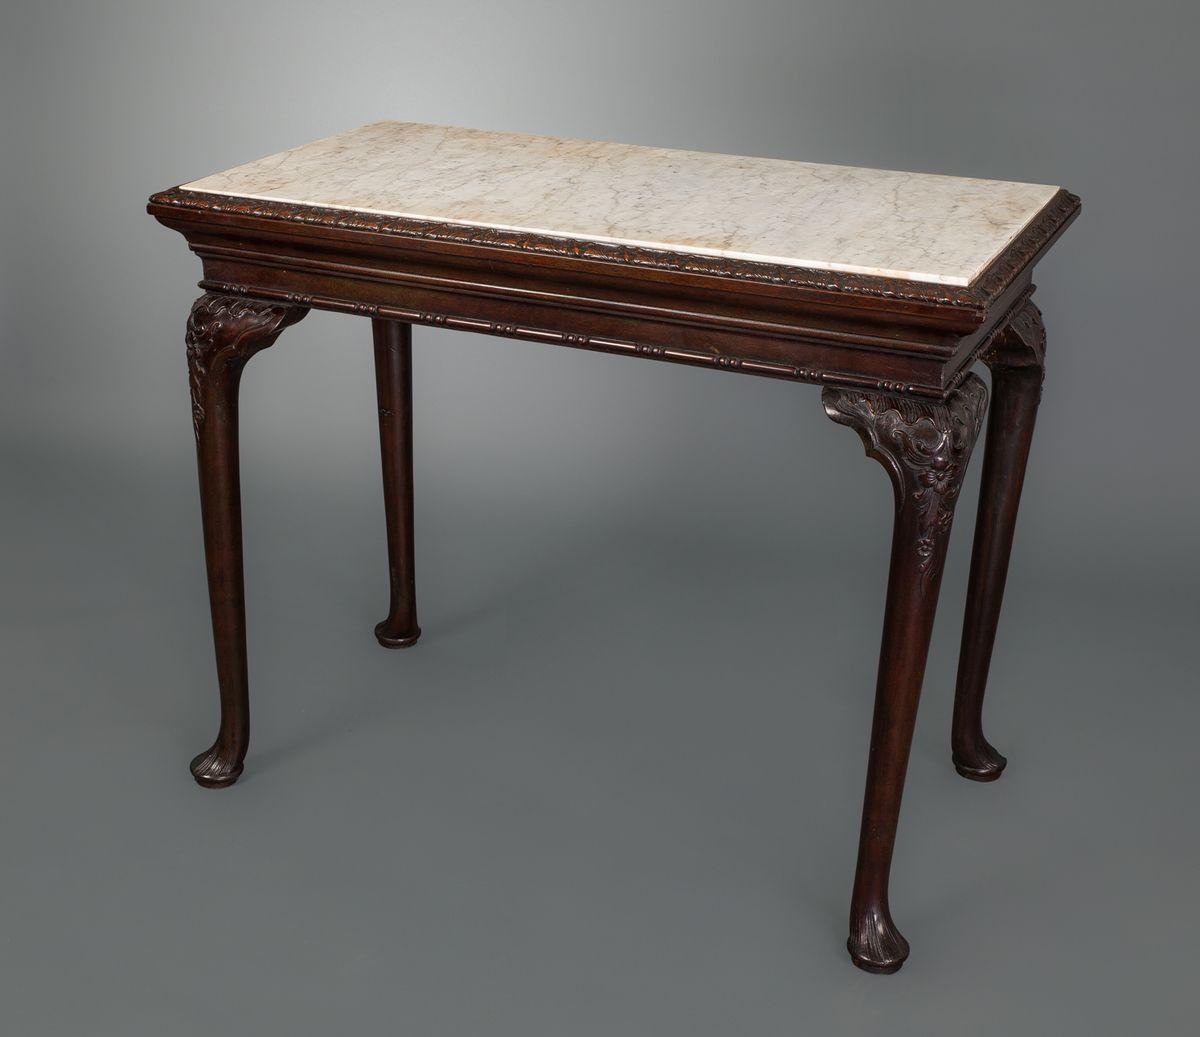 A George Ii Irish Mahogany Small Console Table In 2020 Small Console Tables White Console Table Console Table